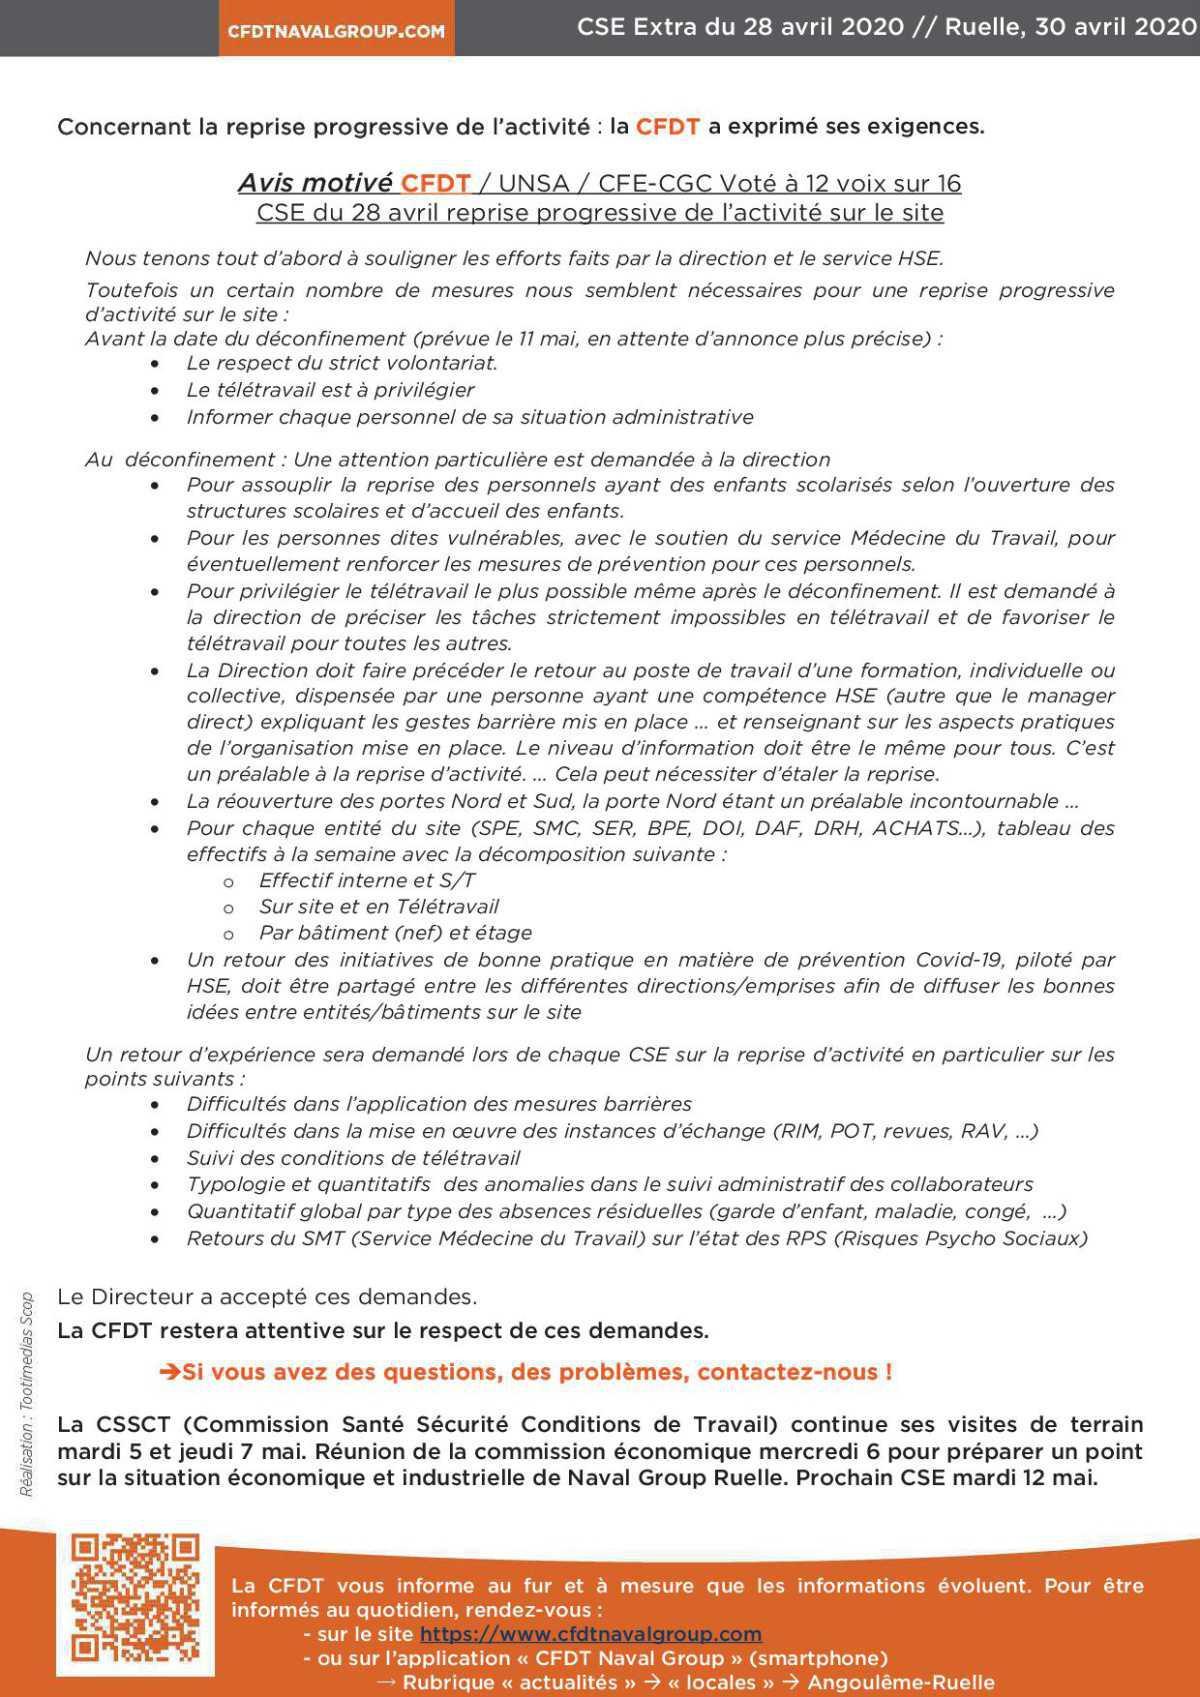 CR CSE extra de Ruelle du 28 avril 2020